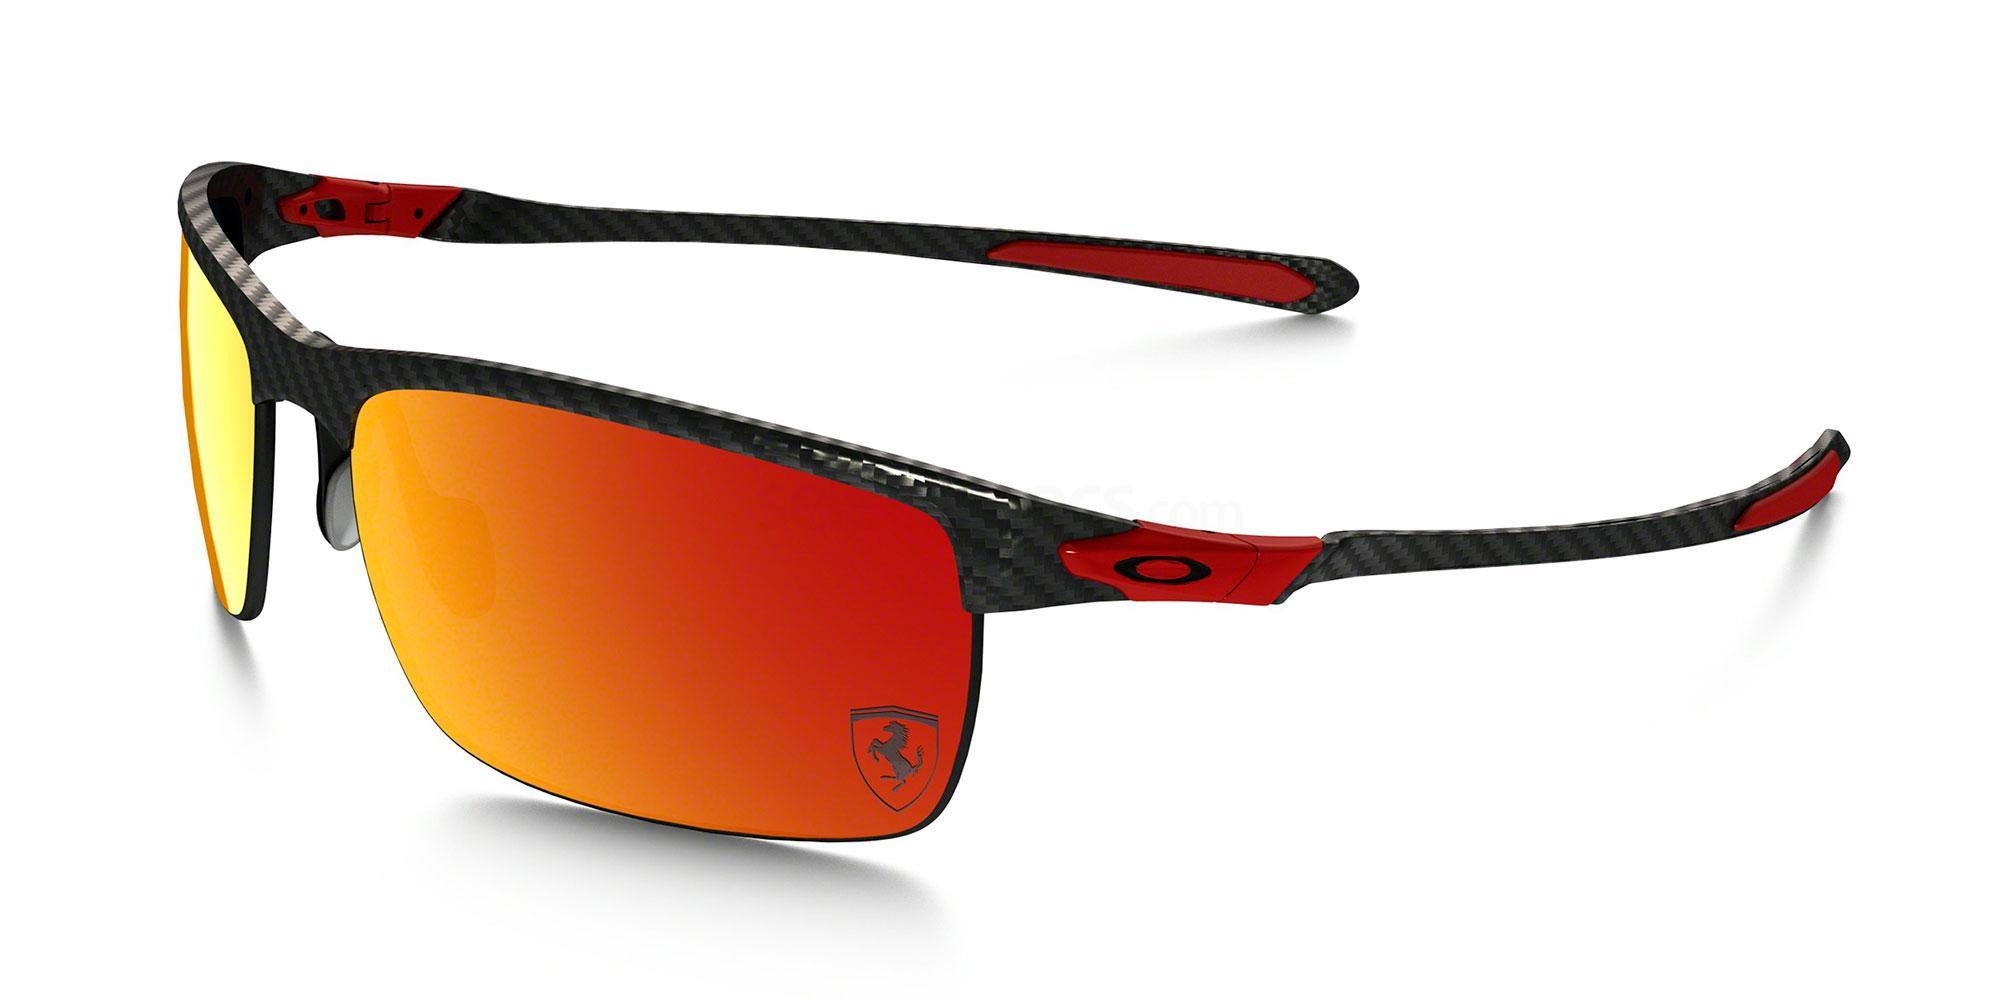 917406 OO9174 SPECIAL EDITION FERRARI POLARIZED CARBON BLADE Sunglasses, Oakley